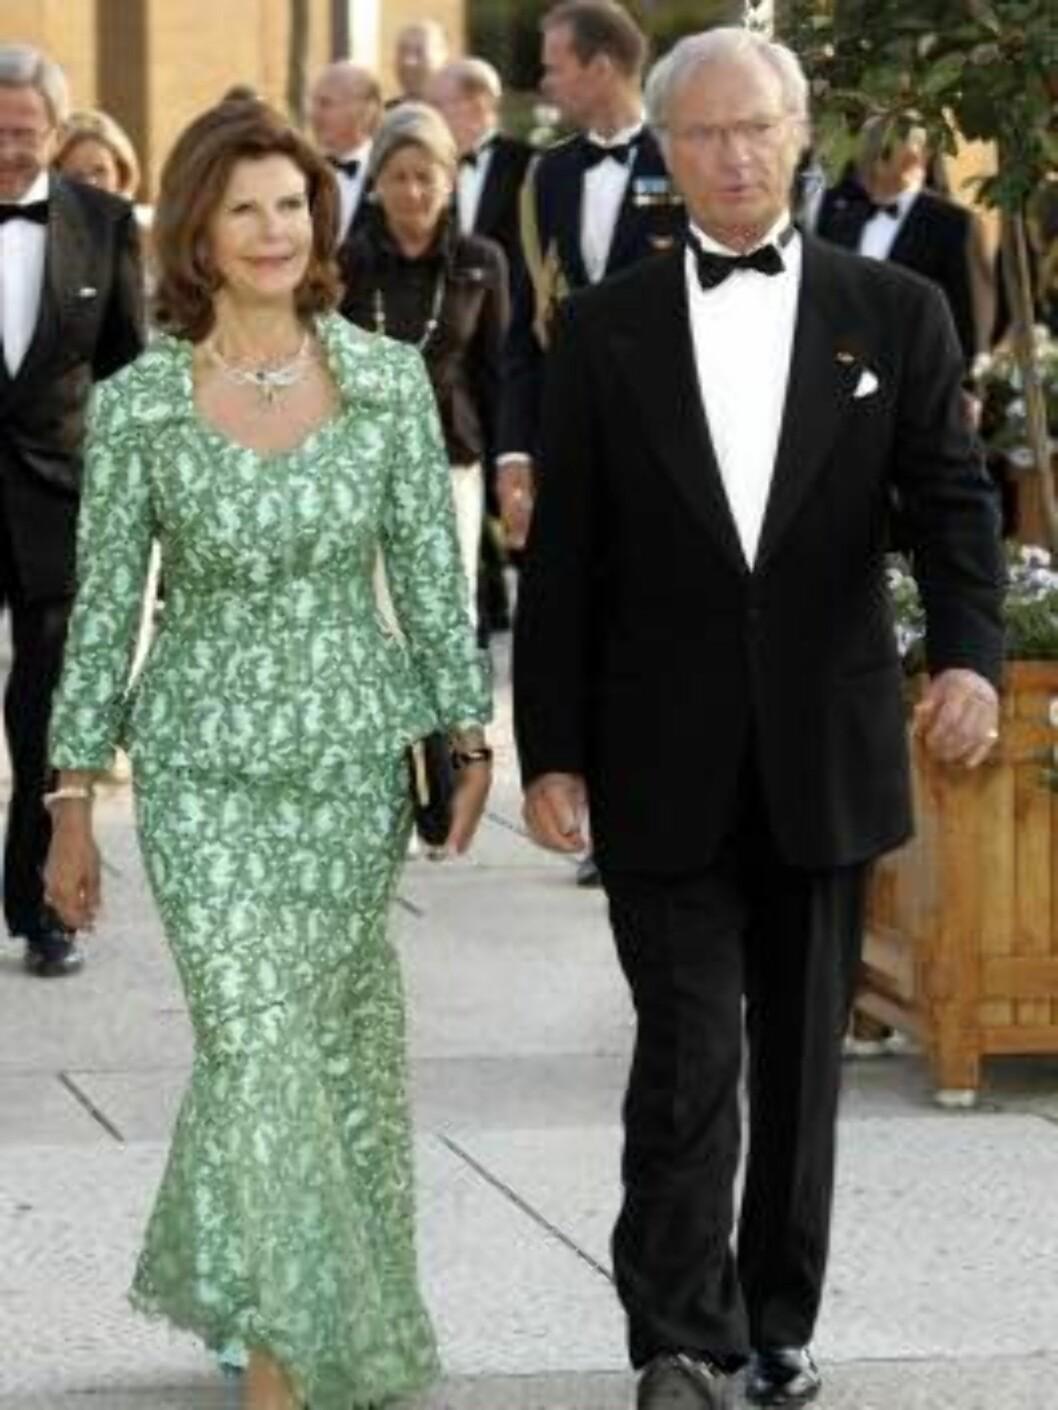 <strong>GRØNN GLEDE:</strong> Sveriges kongepar dronning Silvia og kong Car Gustaf på vei til fredagens festforestilling. Foto: All Over Press